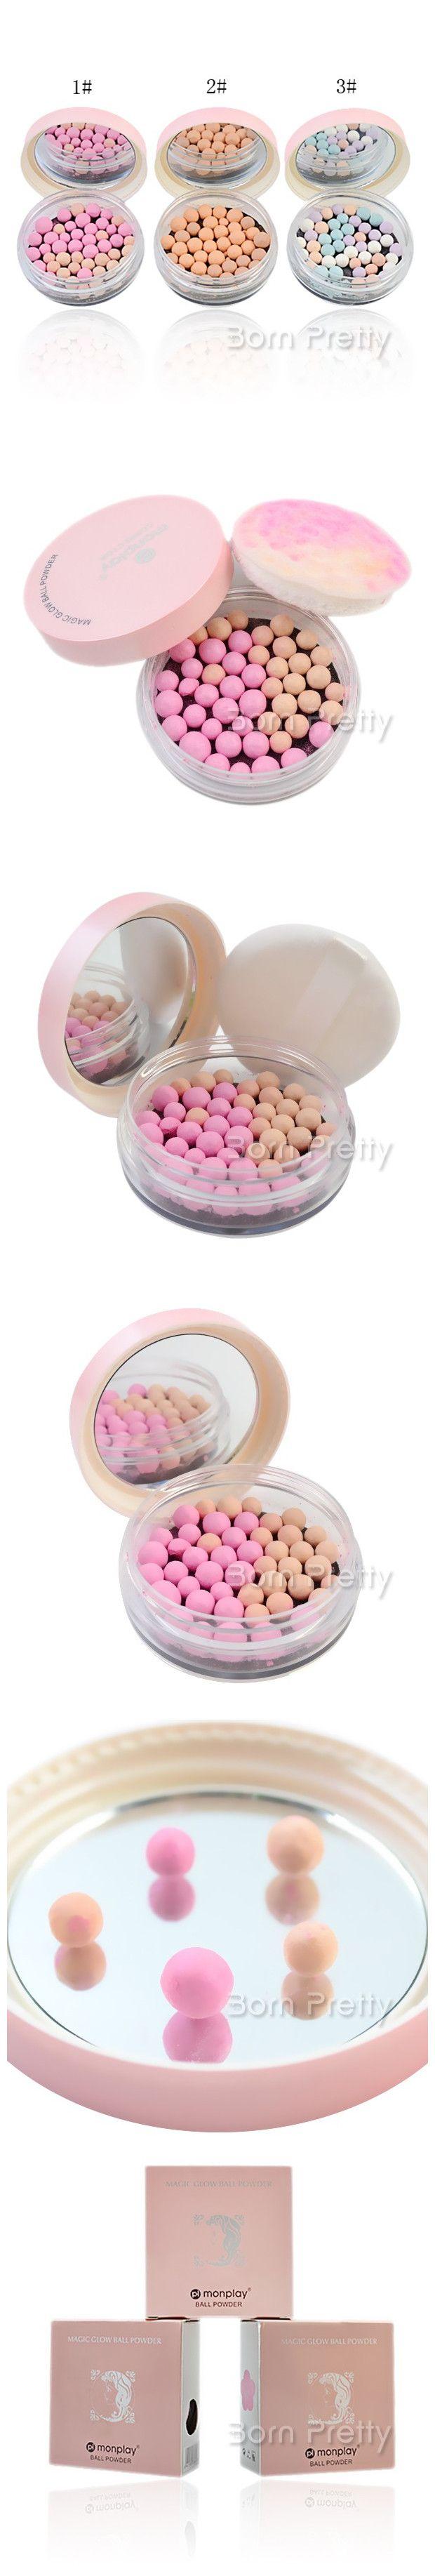 $5.33 1pc Magic Glow Ball Powder Face Concealer Powder Cosmetic Makeup - BornPrettyStore.com